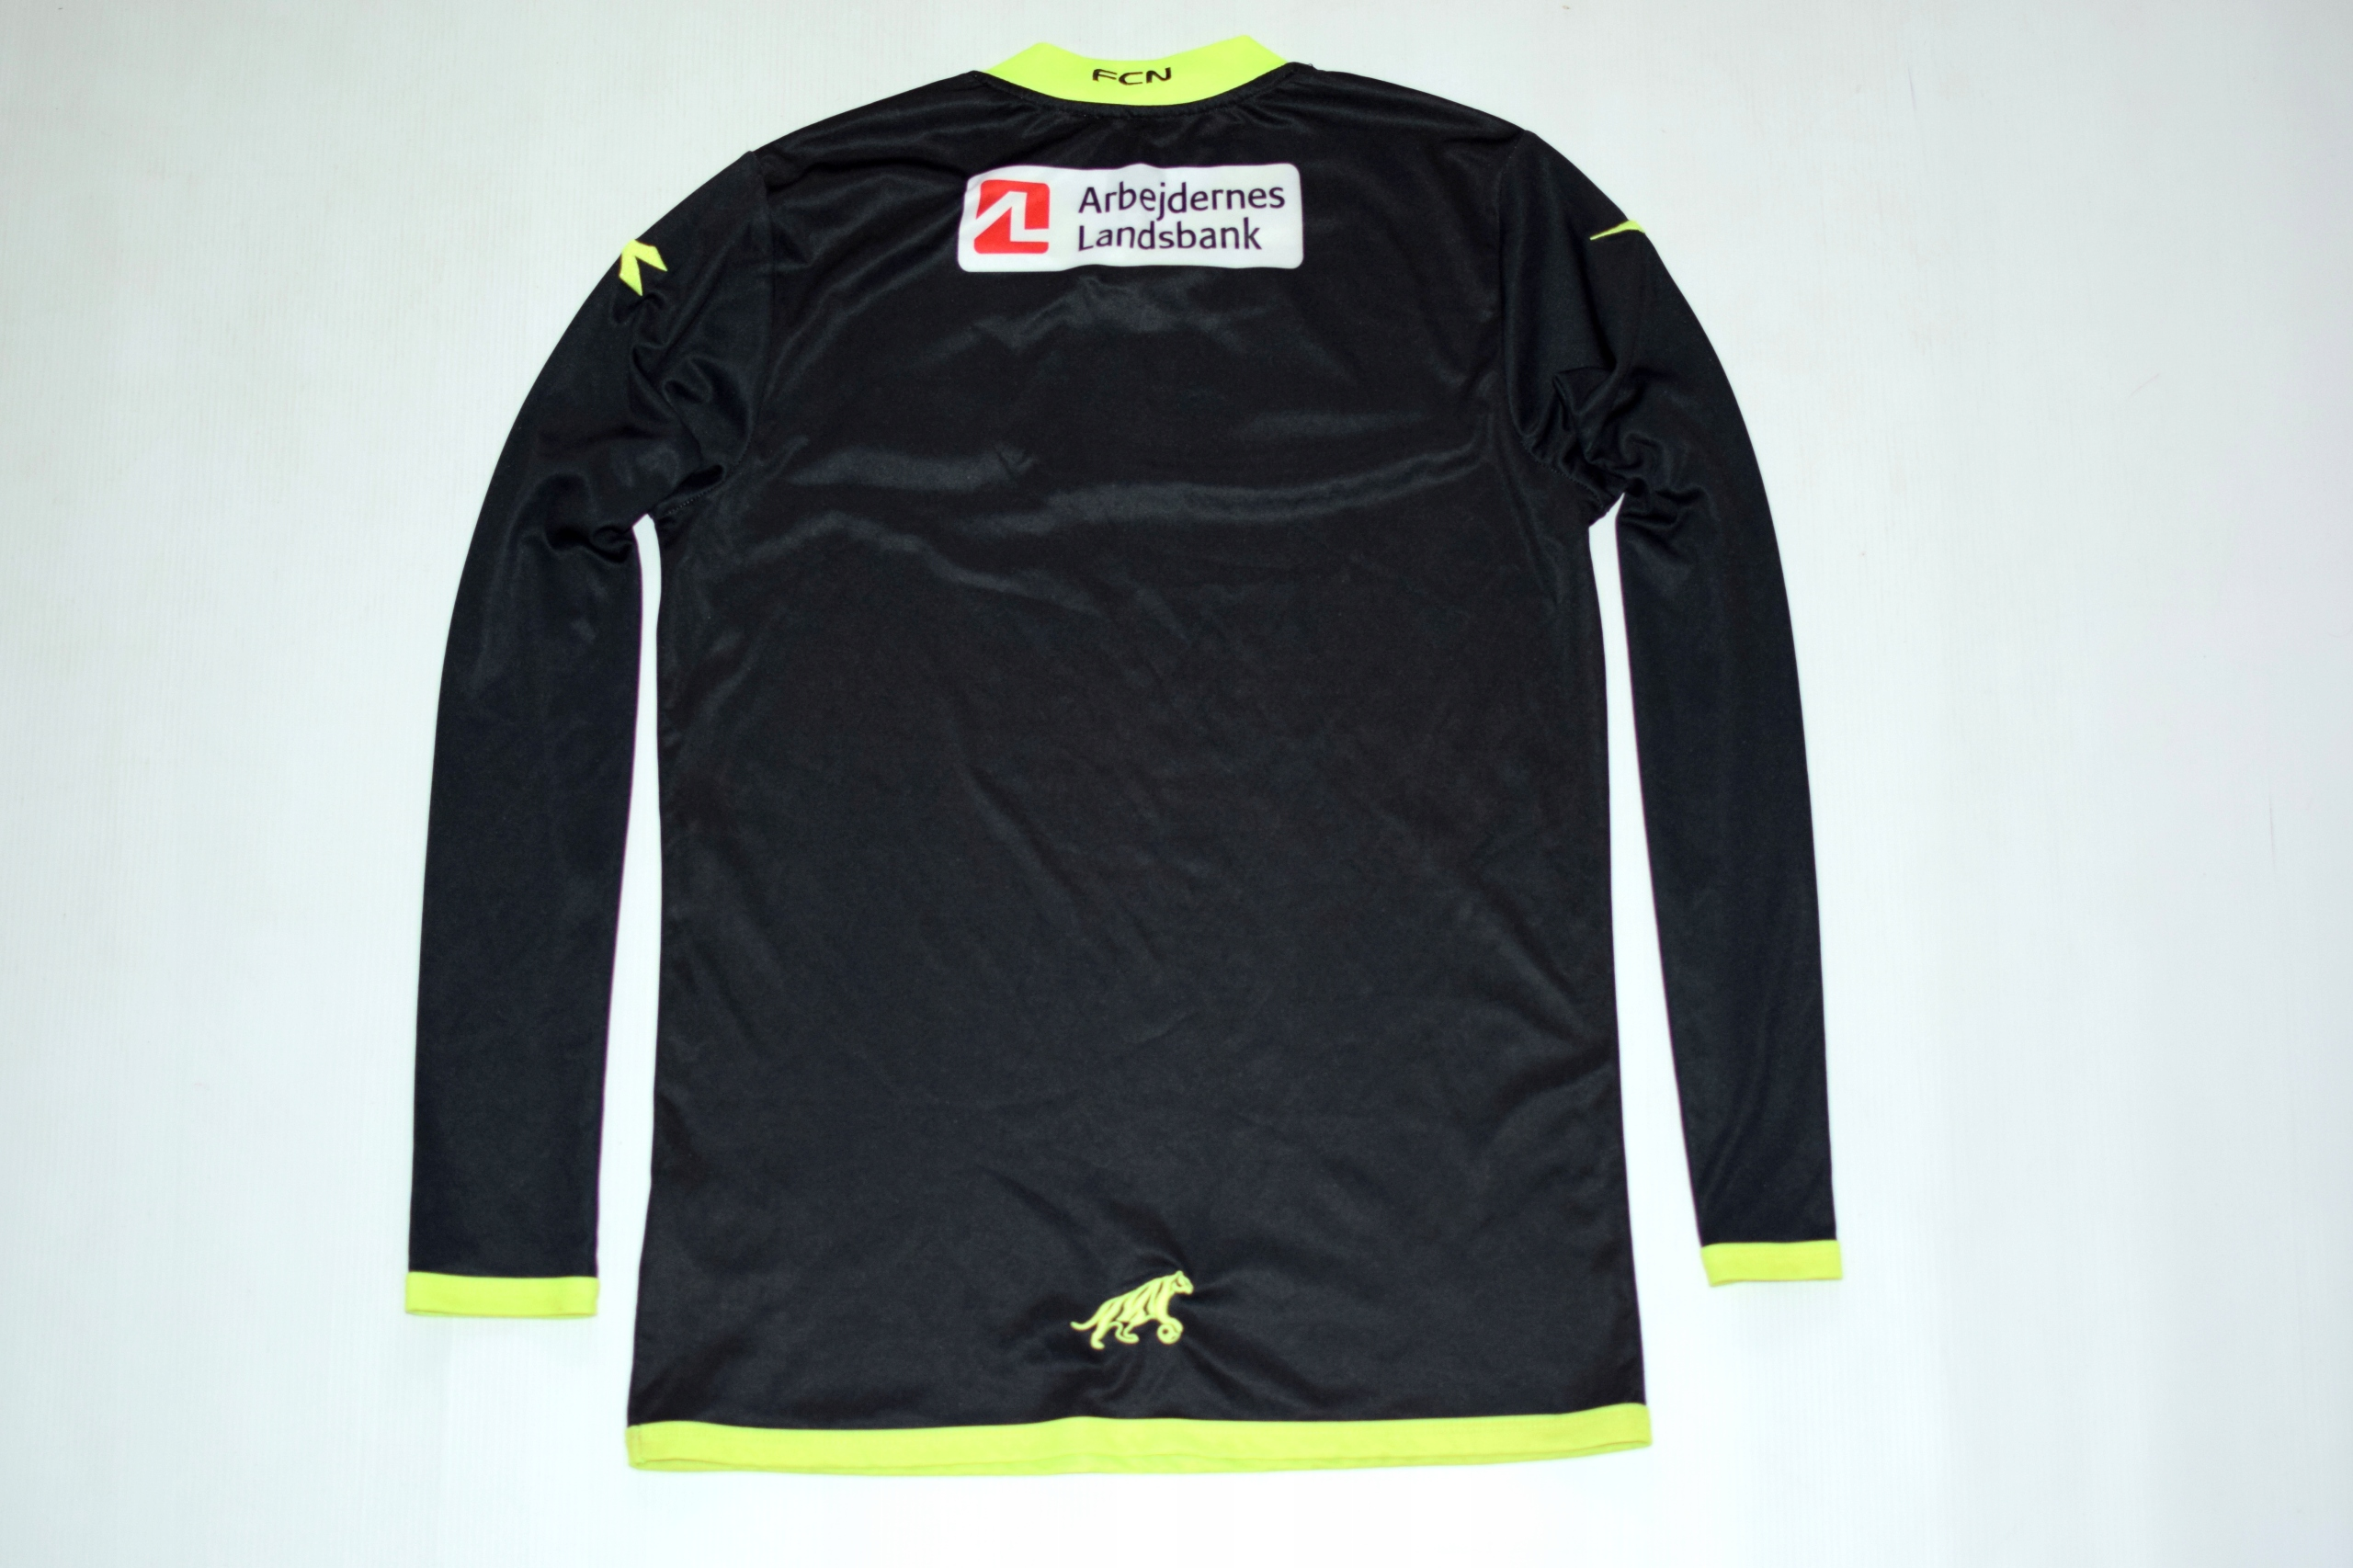 855fca017 DIADORA _ FC NORDSJAELLAND _ Koszulka _ OLDSCHOOL - 7724821355 ...